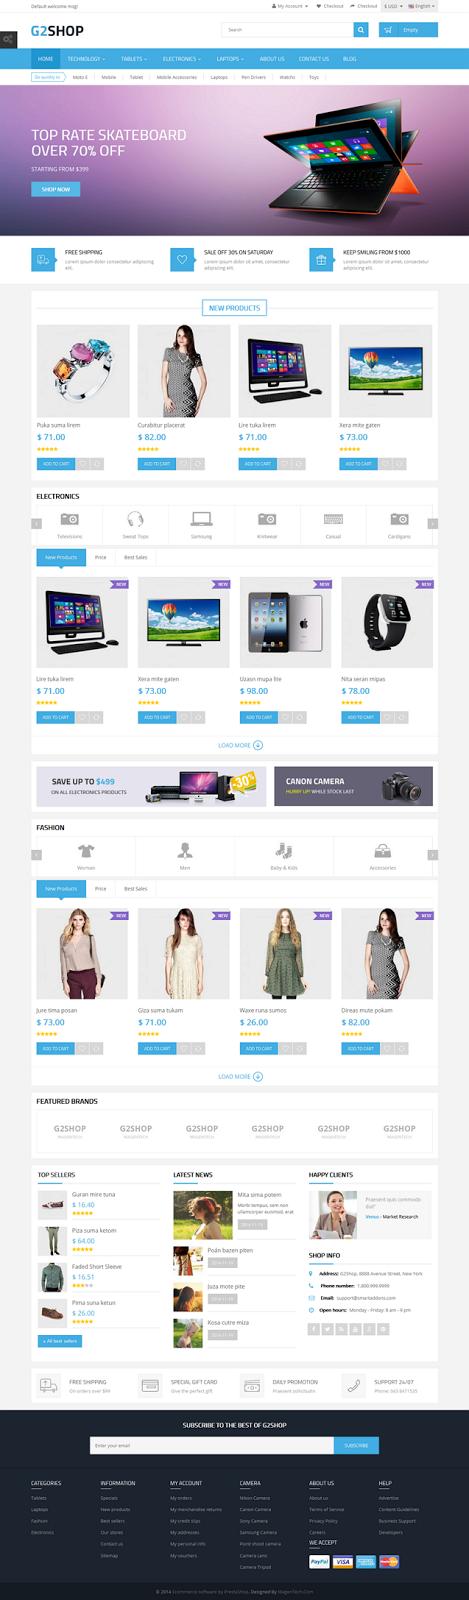 G2Shop New Premium Responsive #Prestashop Theme #tech #fashion #webdesign